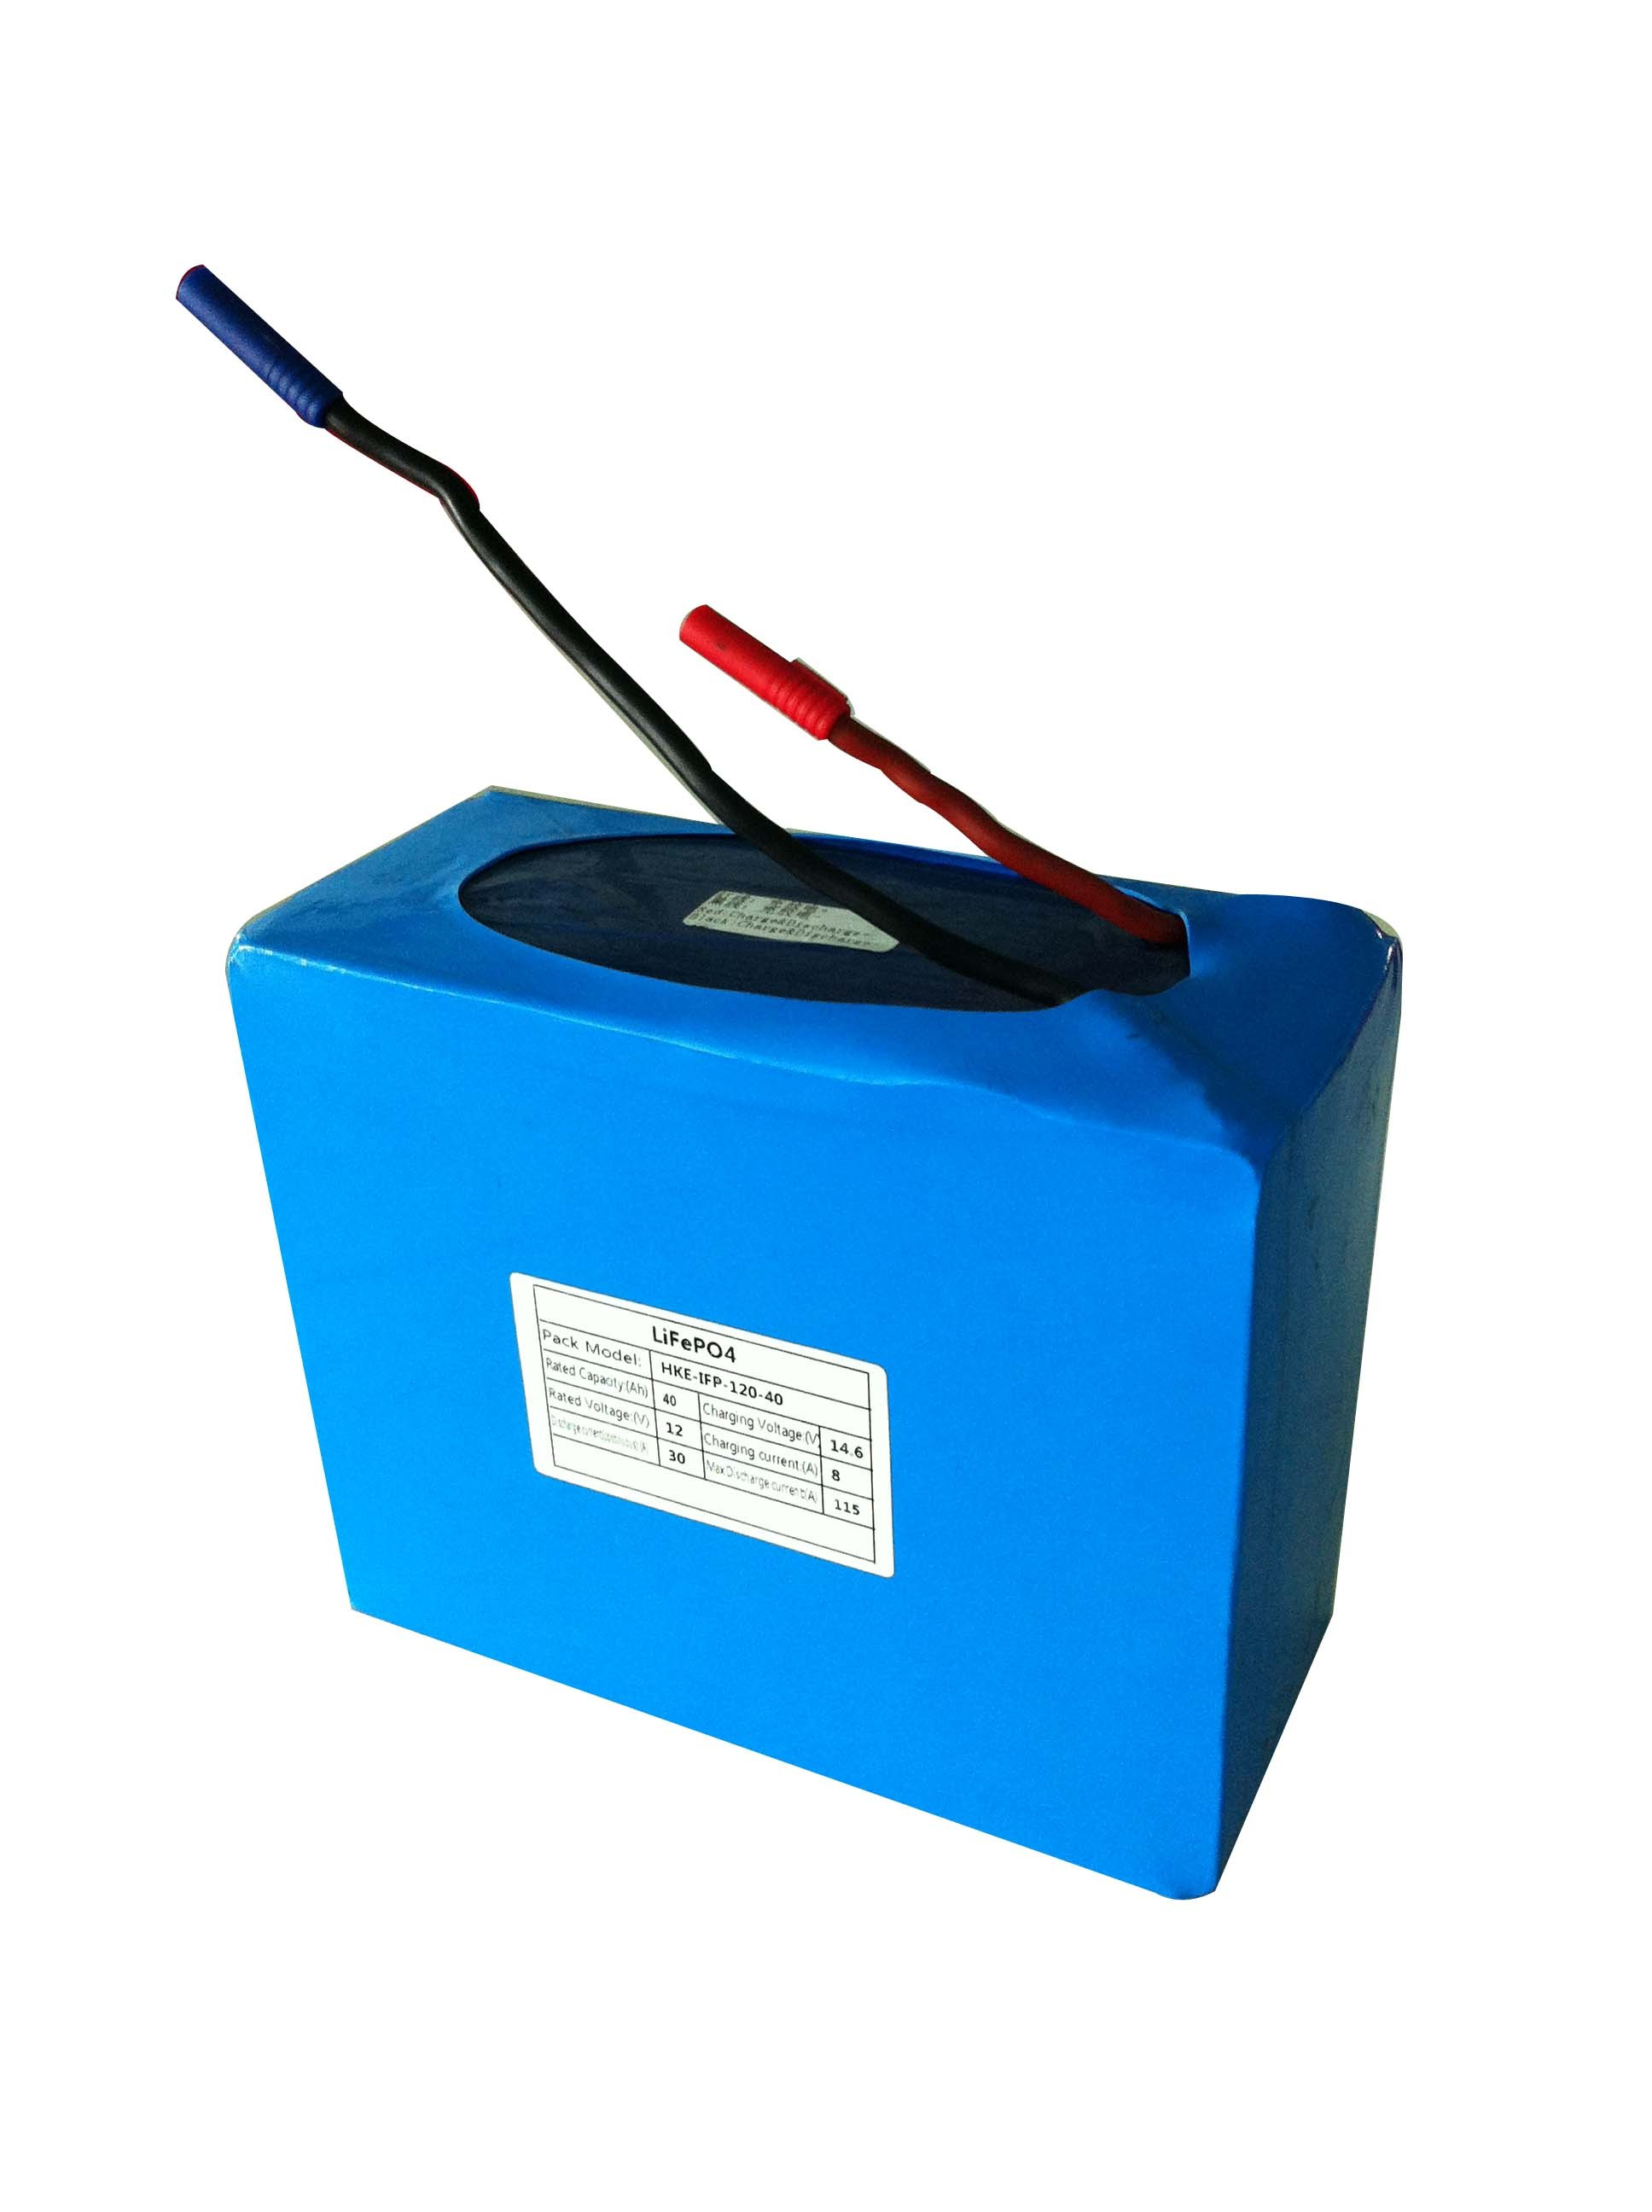 12volt Lifepo4 Battery 40ah Energy Storage Lithium Ion Batteries For Solar Street Light